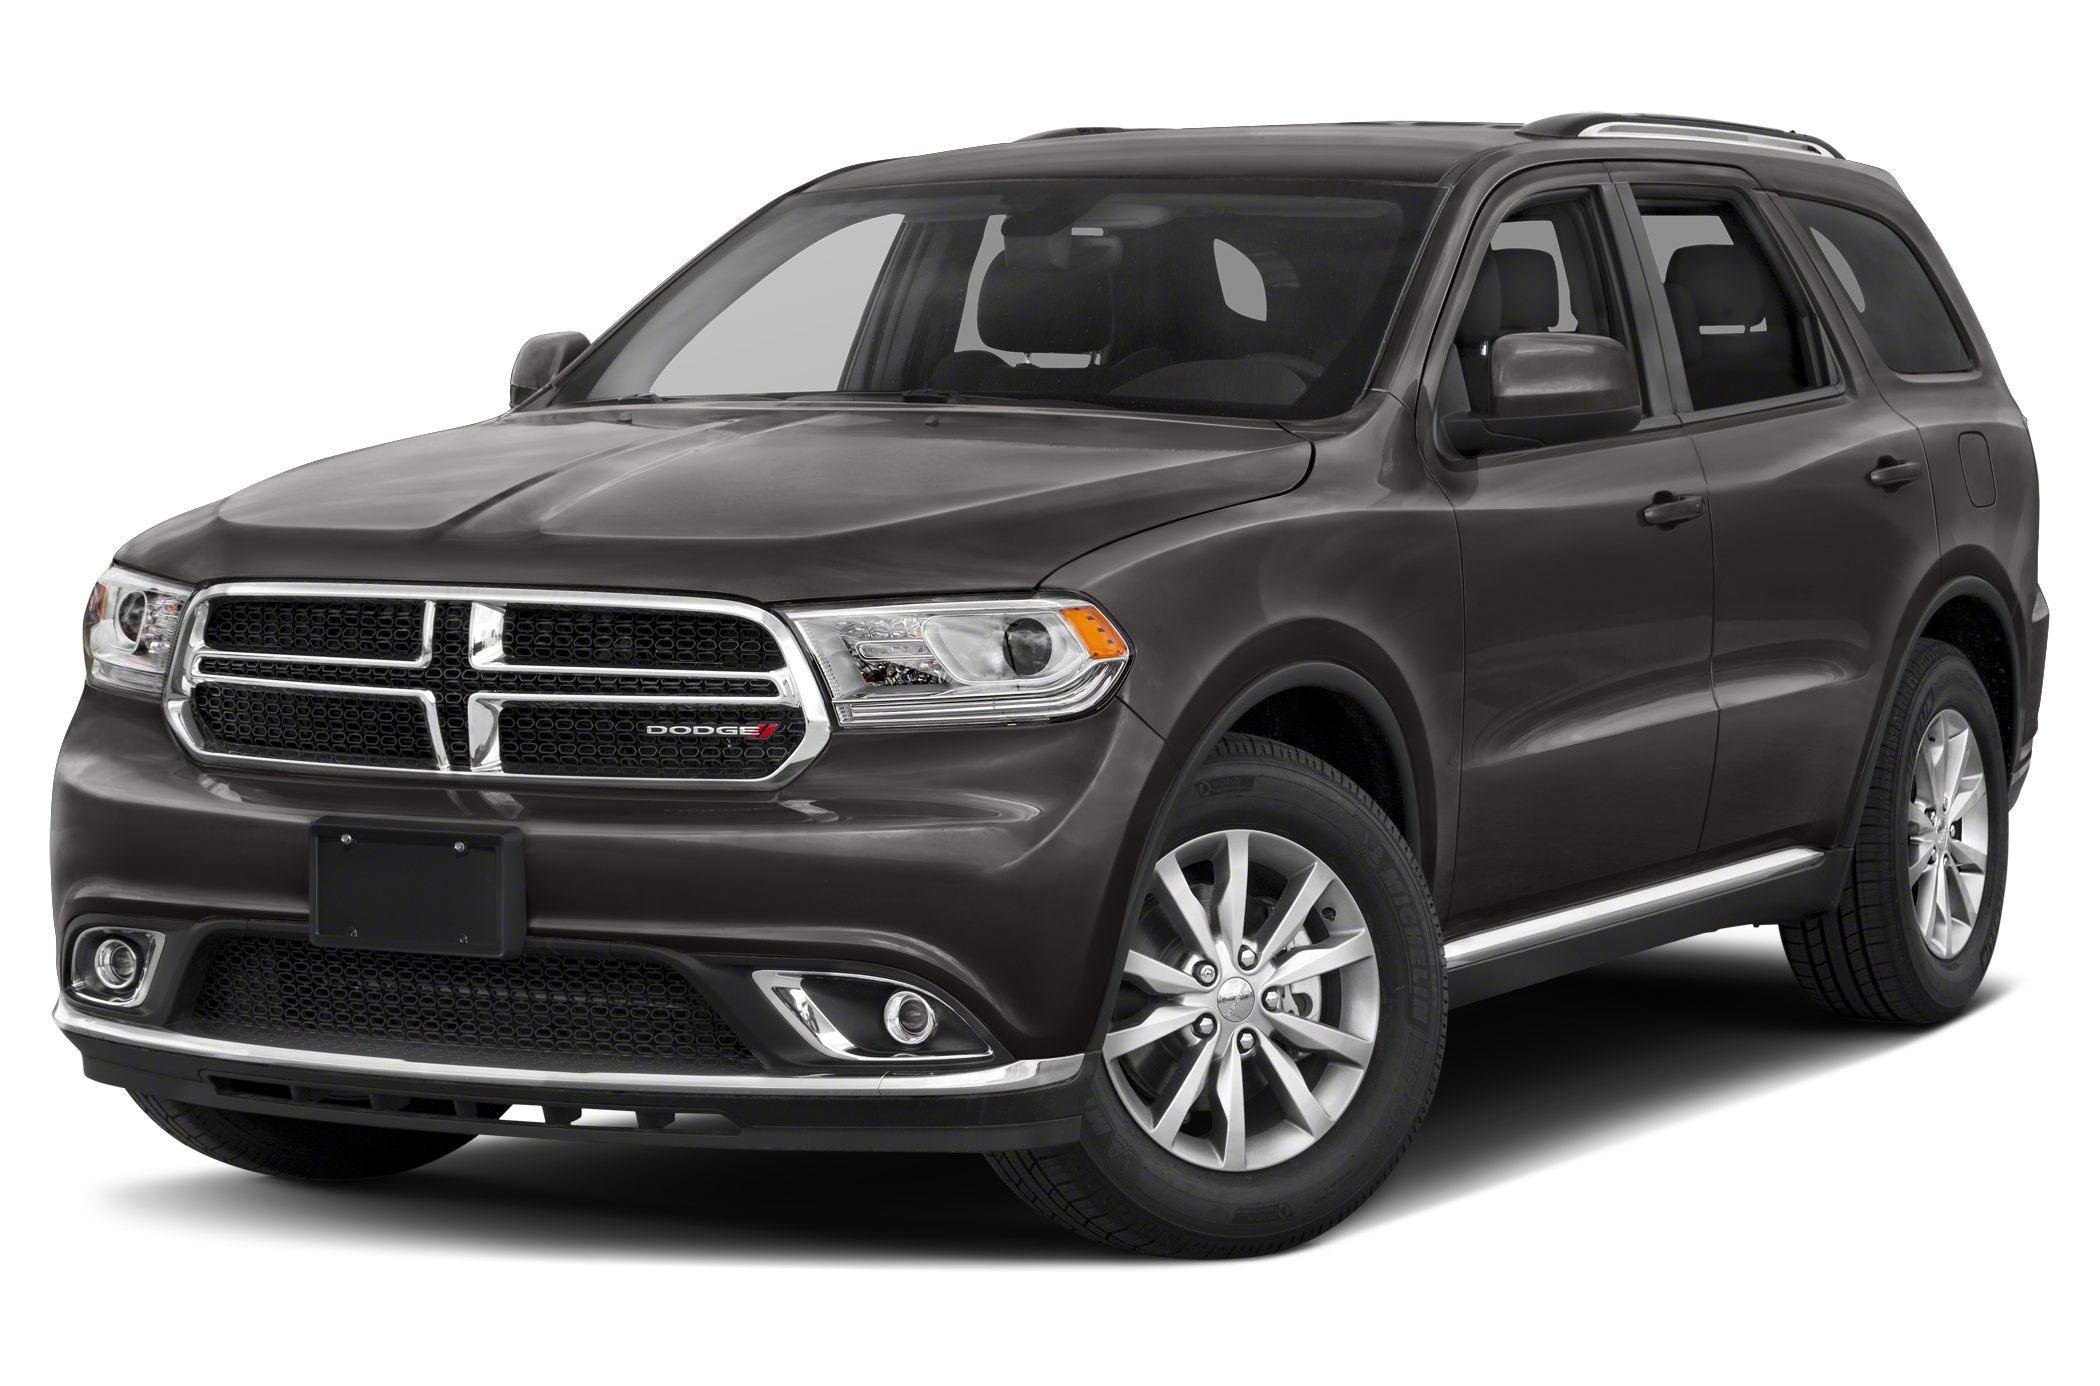 2018 Dodge Durango New Car Test Drive